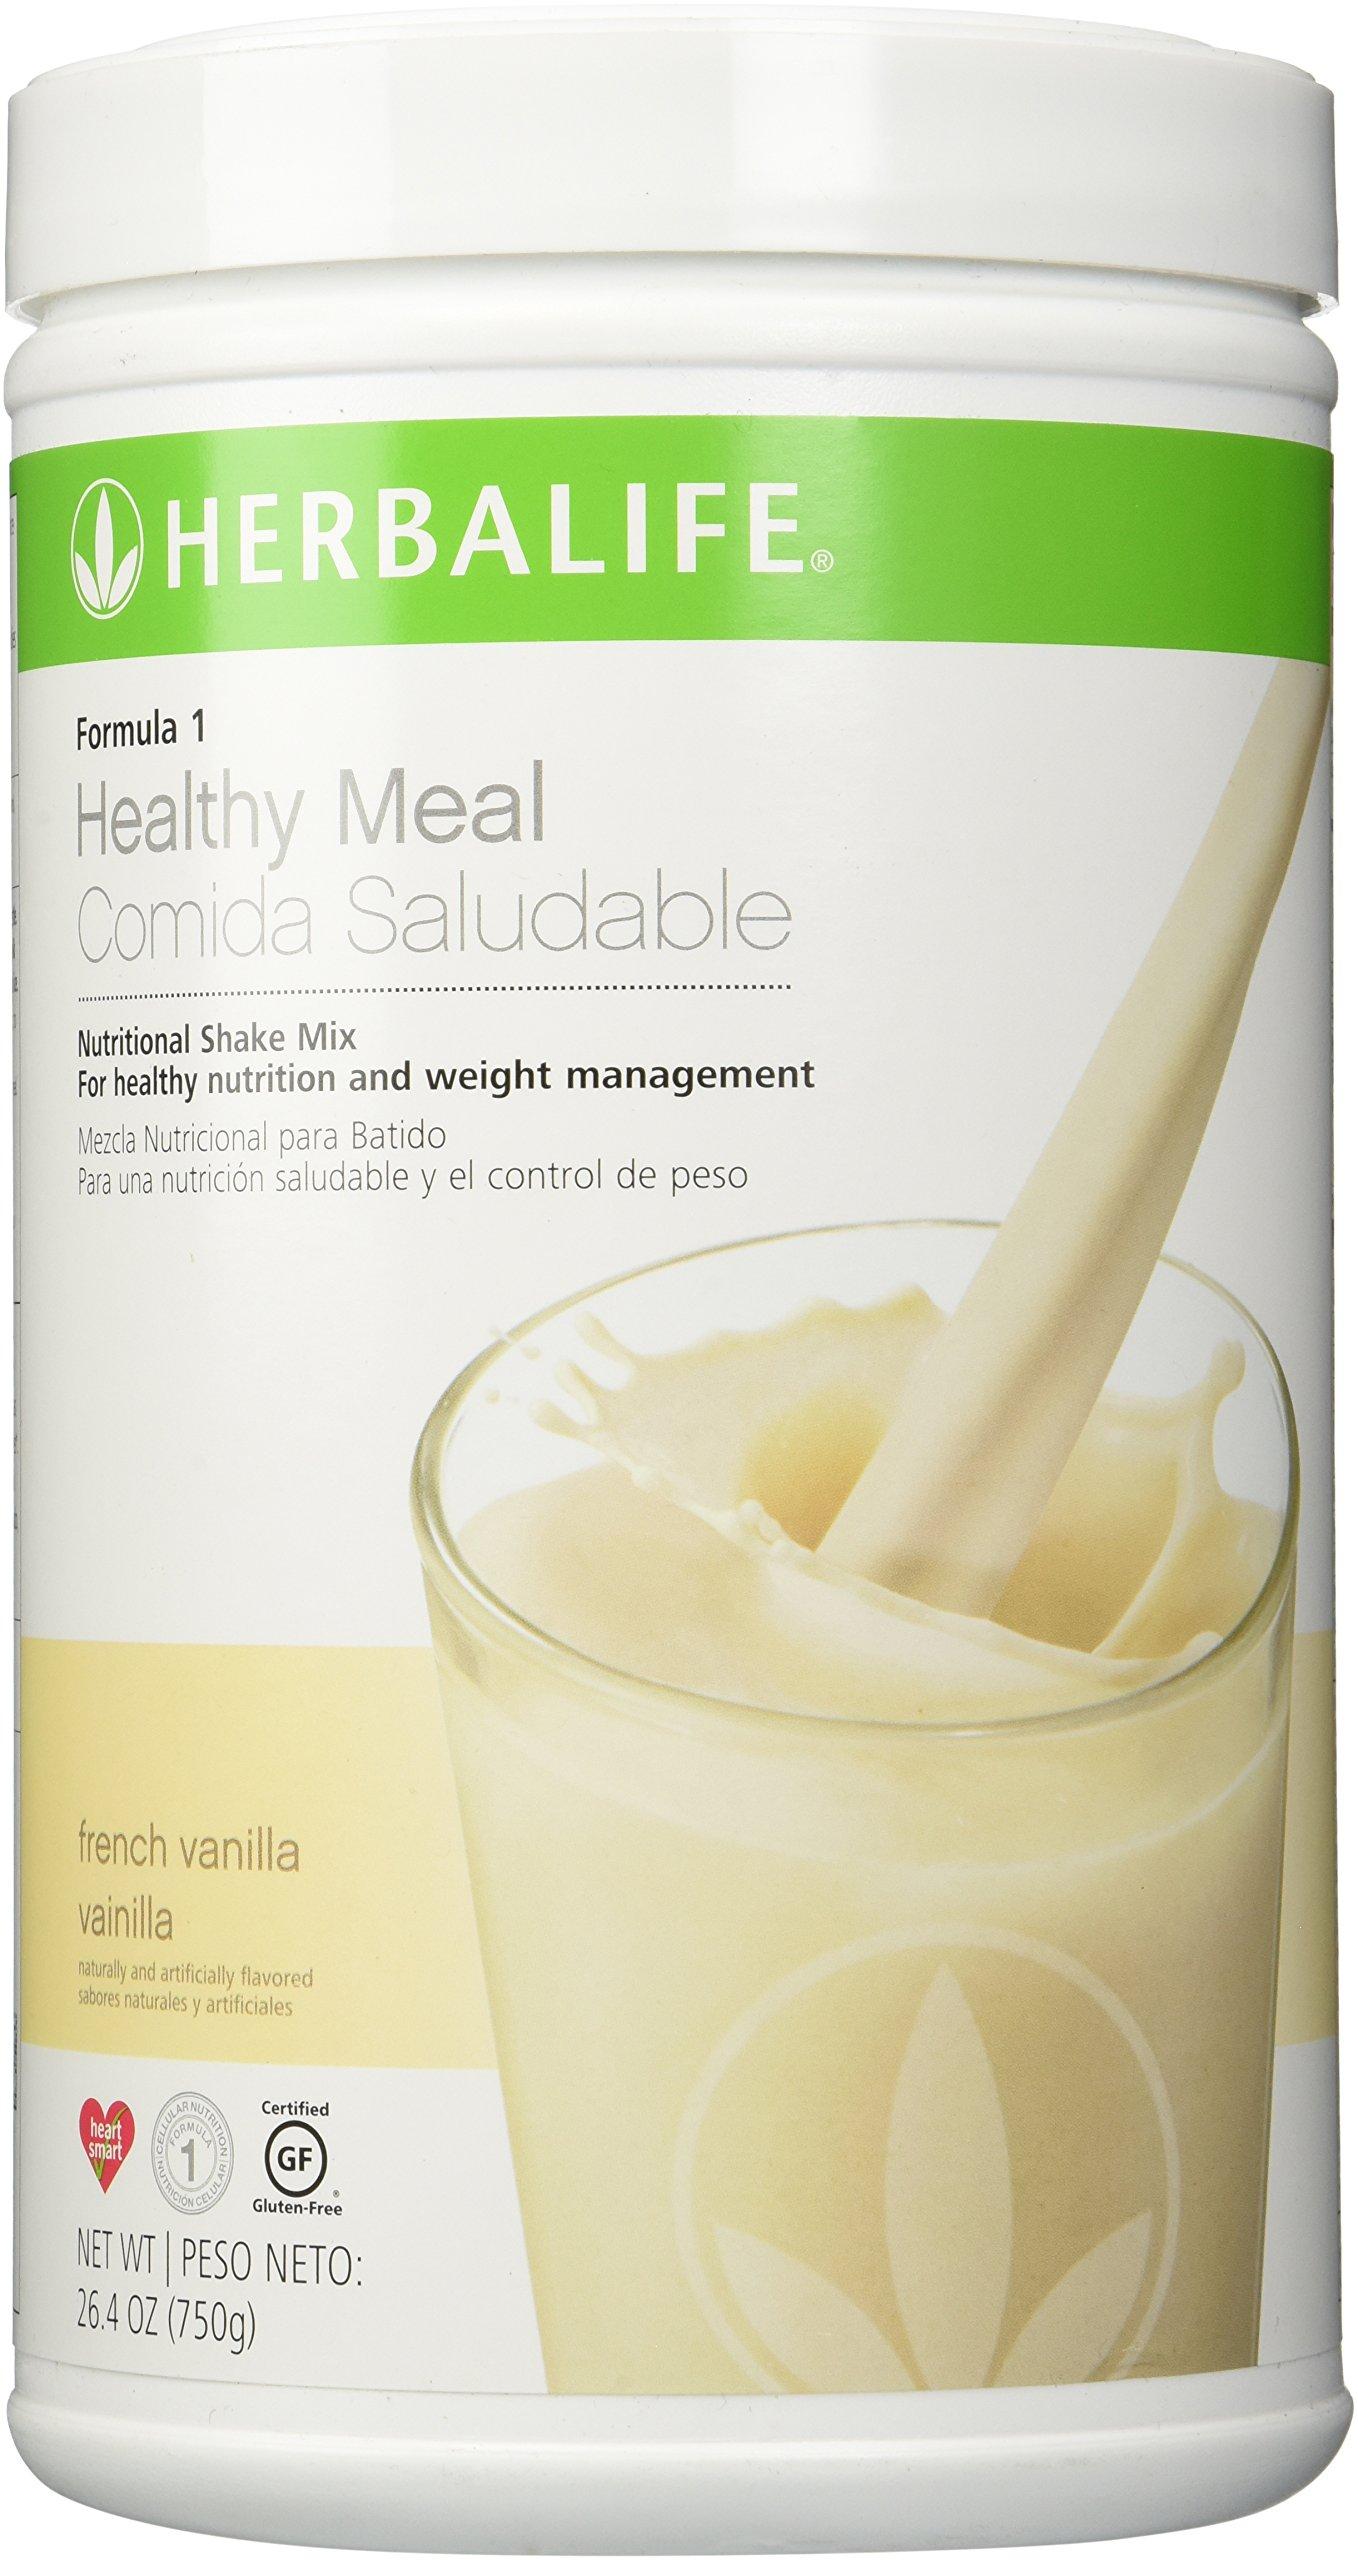 Herbalife Formula 1 Nutritional Shake Mix, French Vanilla, 750 Gram by Herbalife